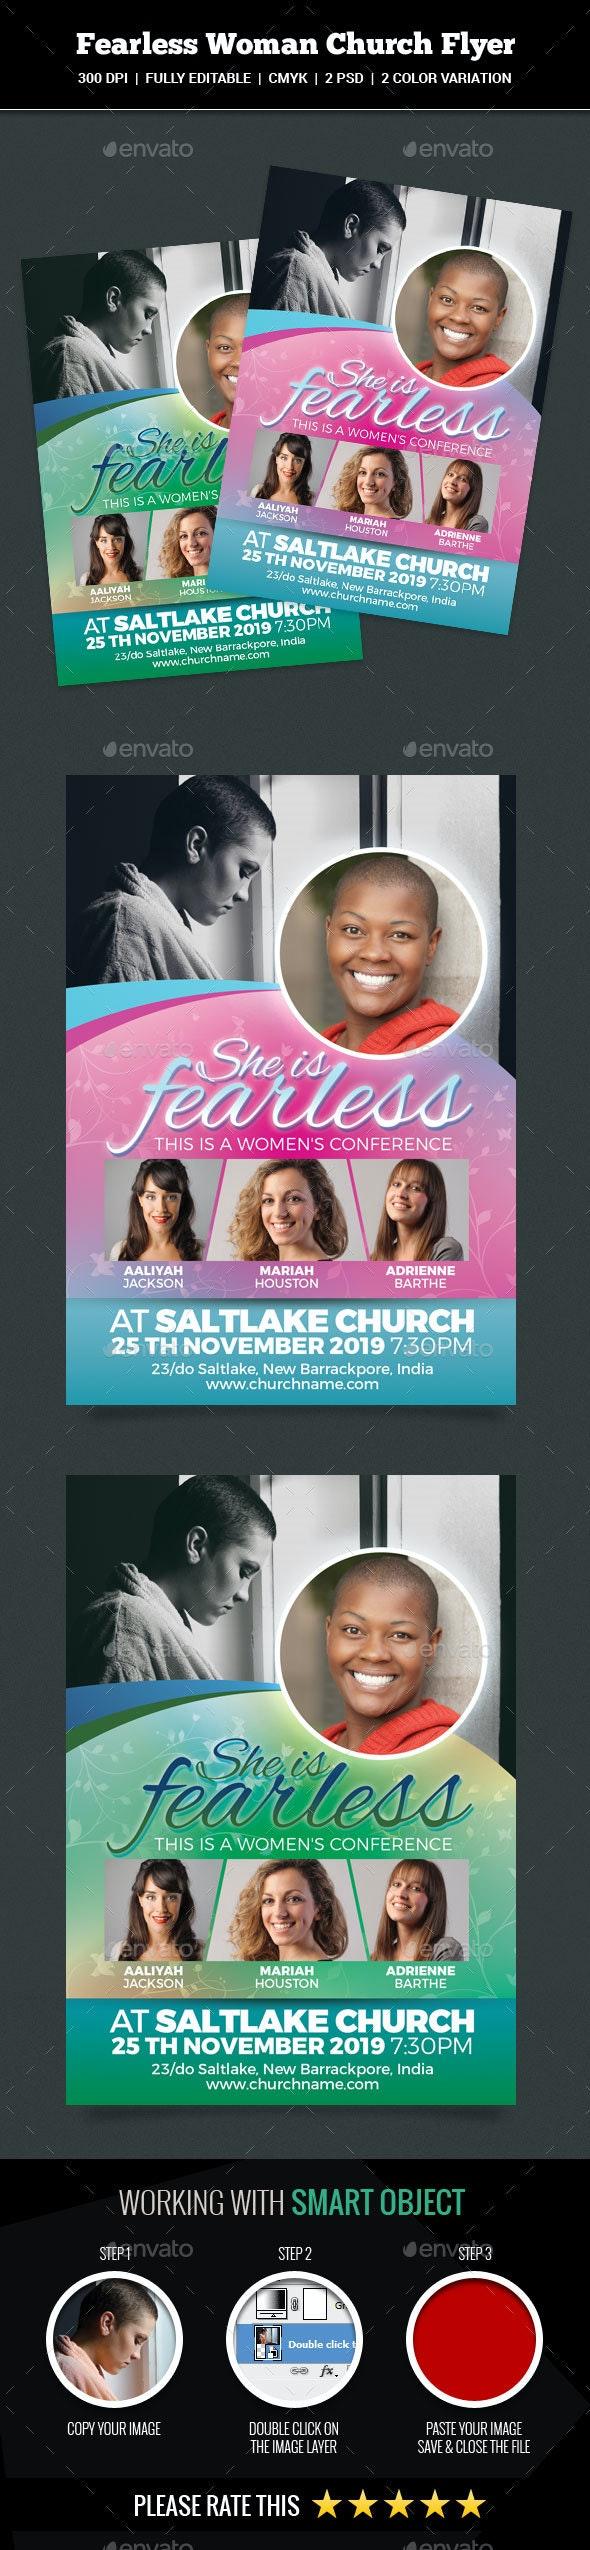 Fearless Woman Church Flyer - Church Flyers